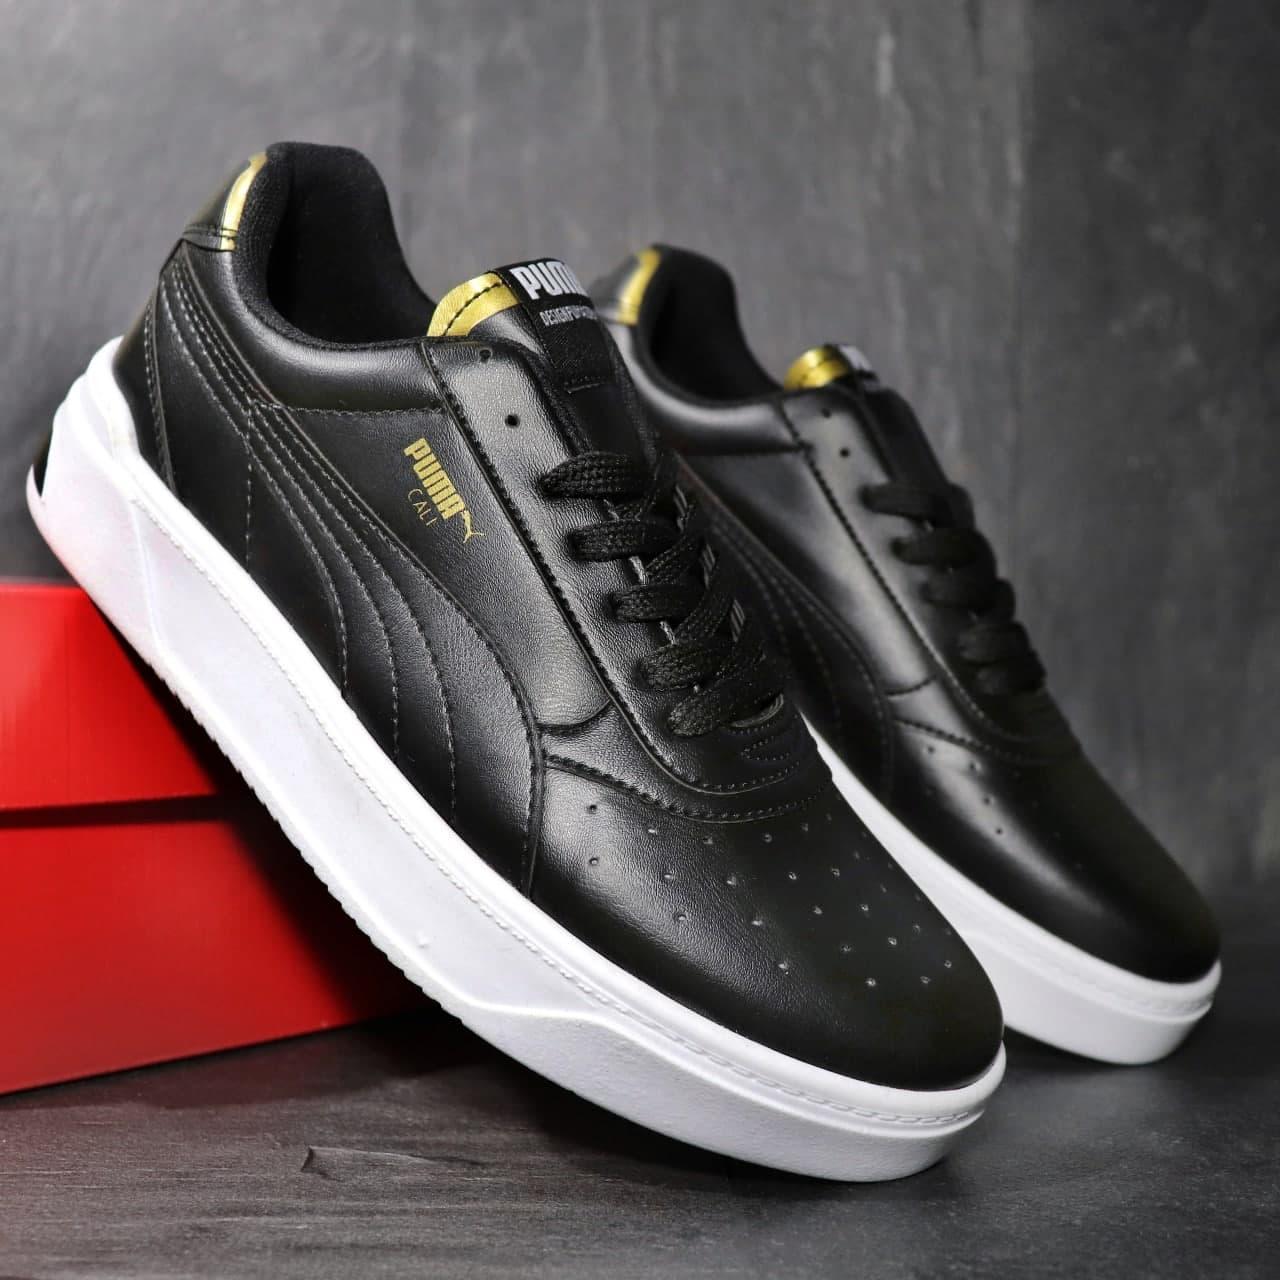 Чоловічі кросівки Puma CALI Black Gold